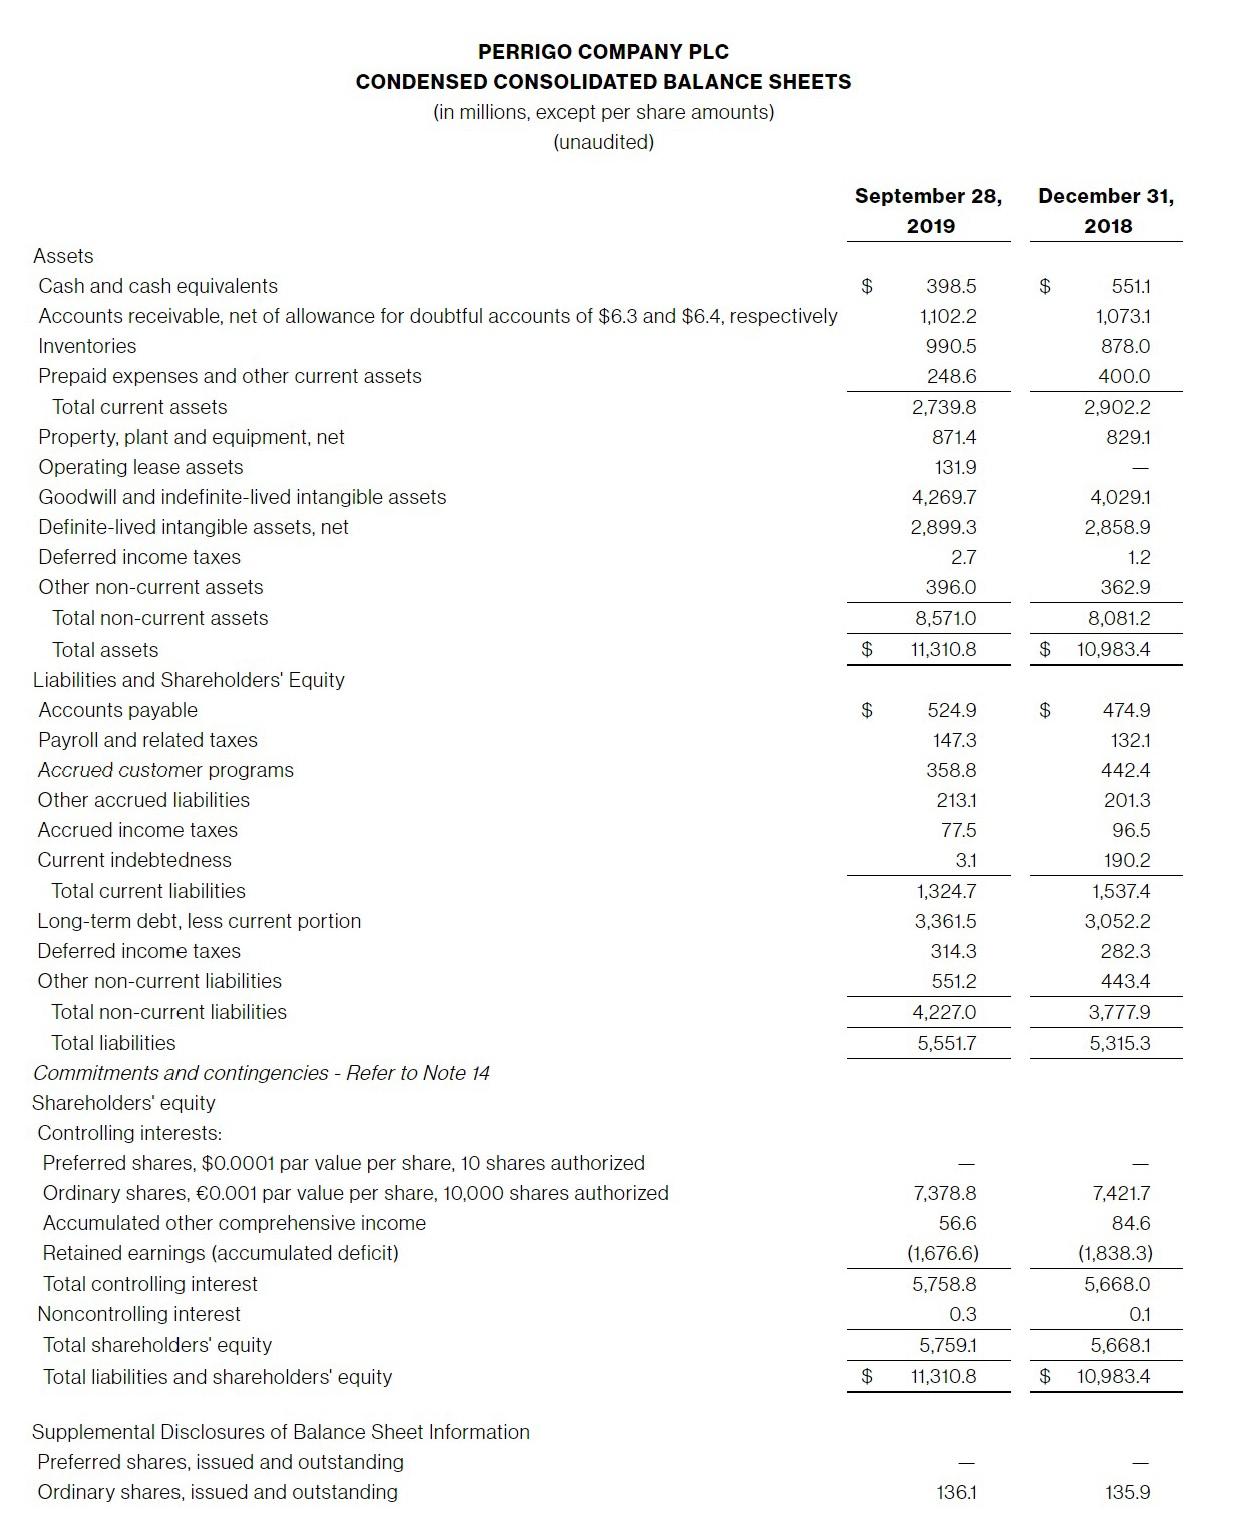 PERRIGO-COMPANY-PLC-CONDENSED-CONSOLIDATED-BALANCE-SHEETS